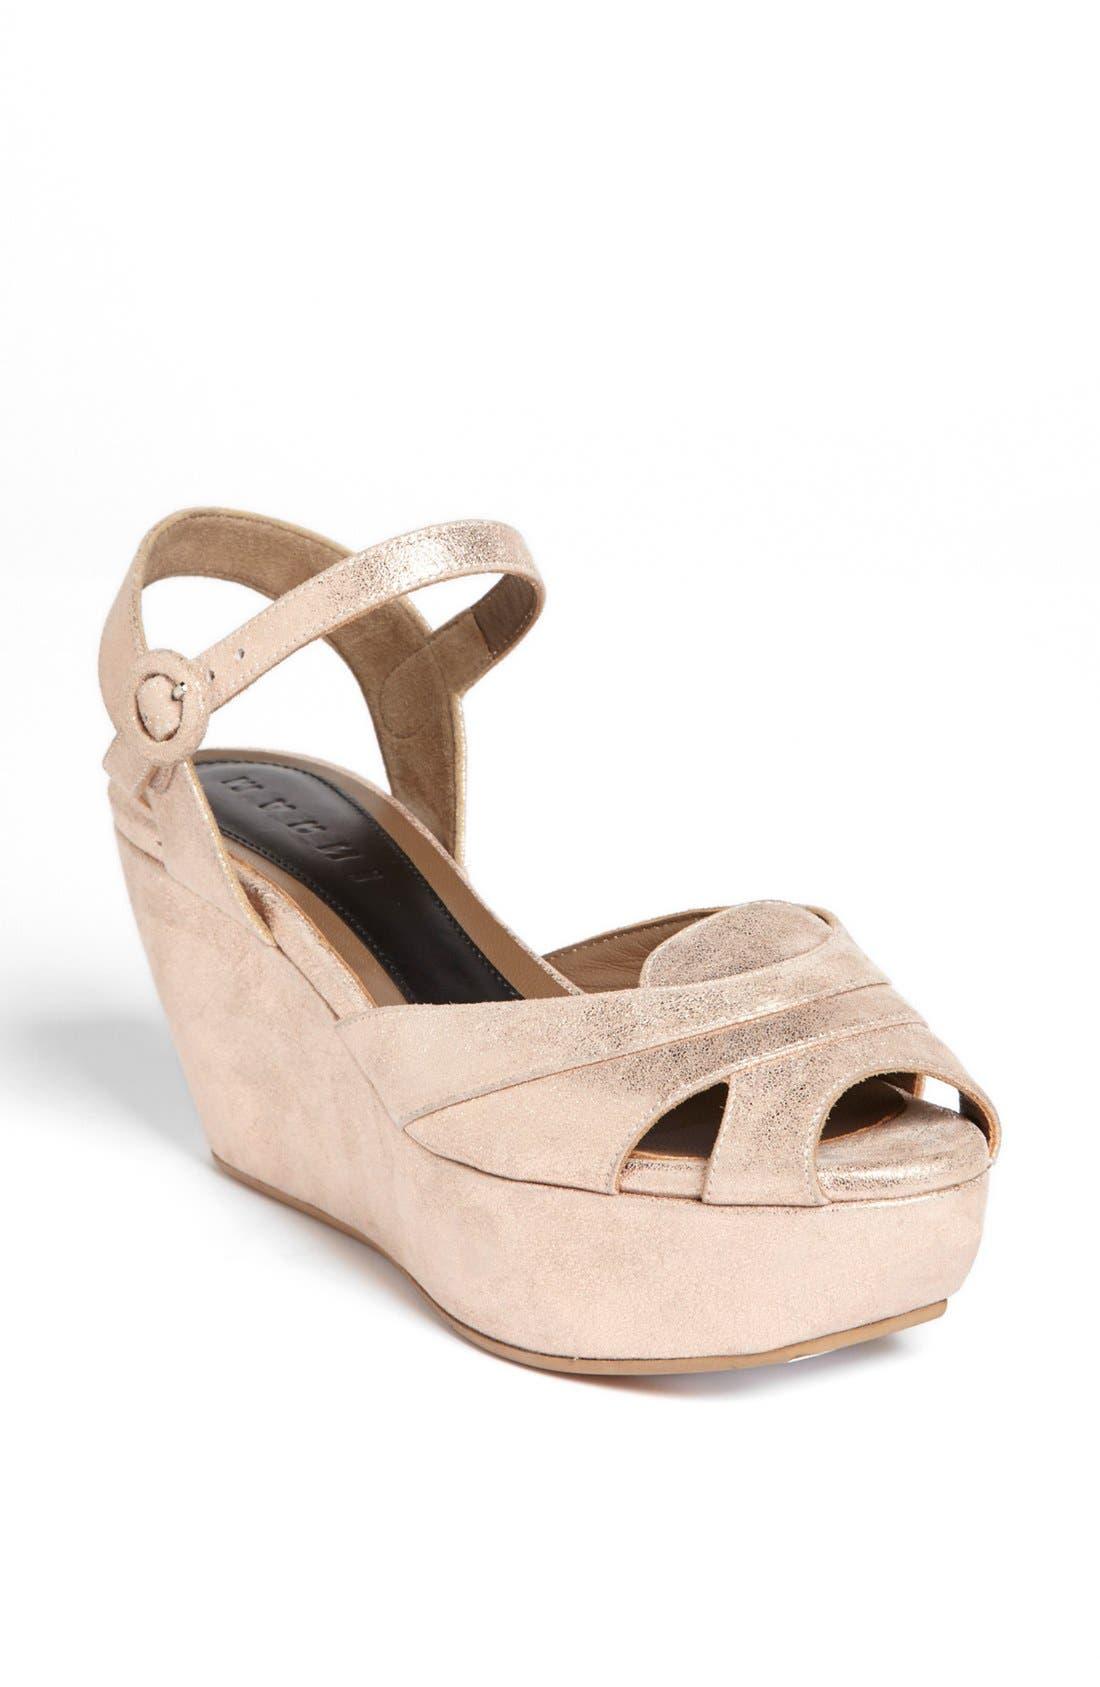 Alternate Image 1 Selected - Marni Wedge Platform Sandal